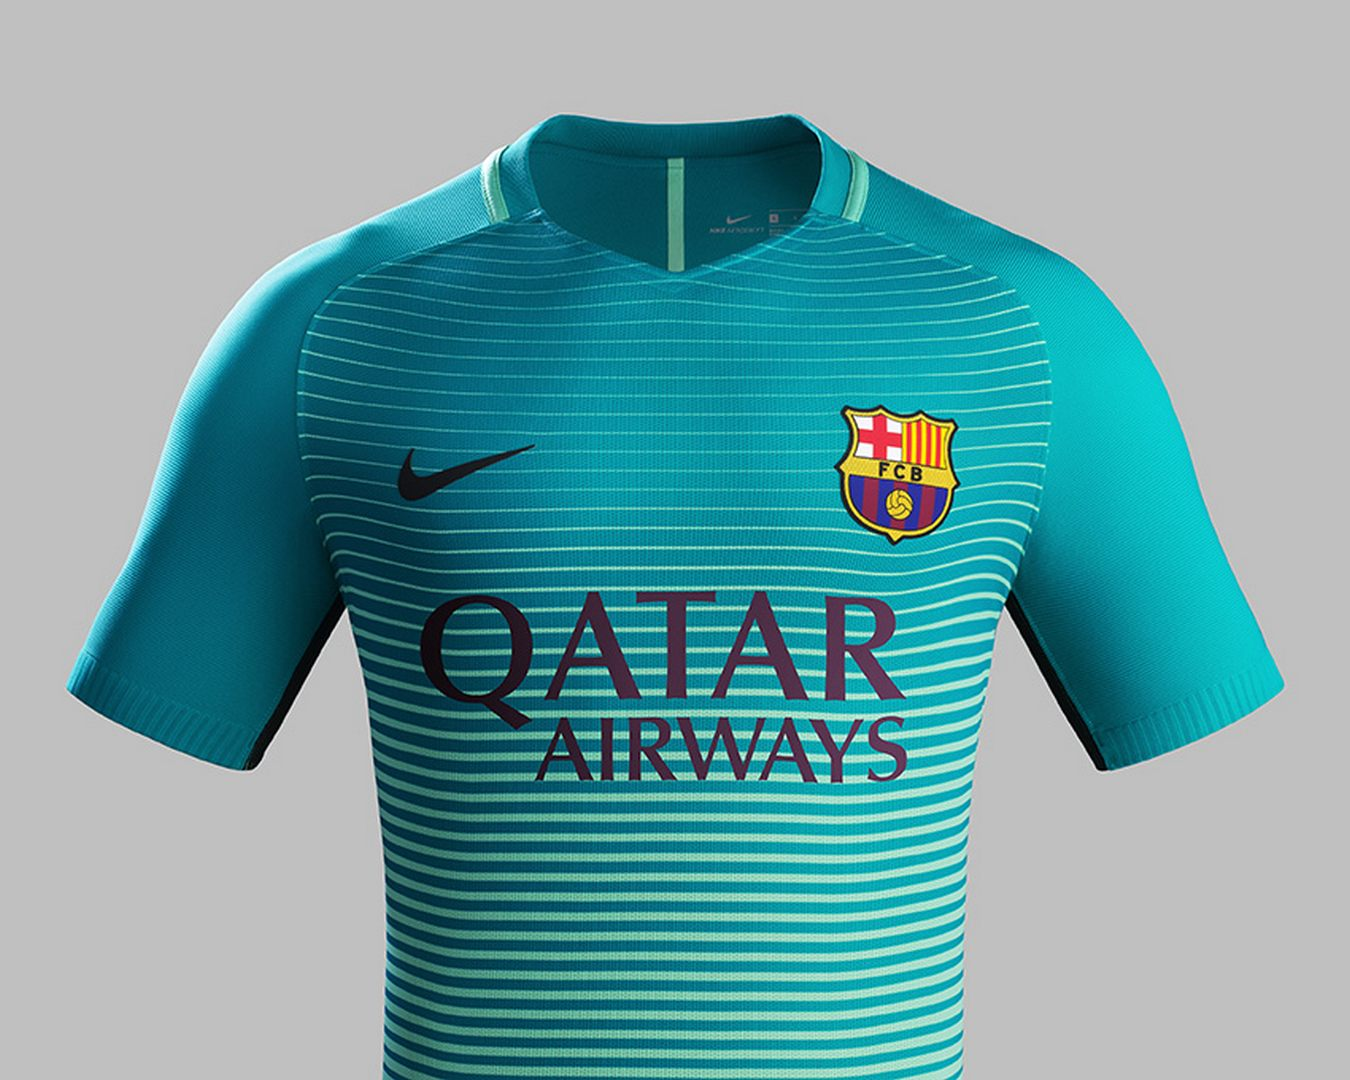 Tercera camiseta nike del barcelona 2016 2017 planeta fobal for Maillot exterieur barca 2017